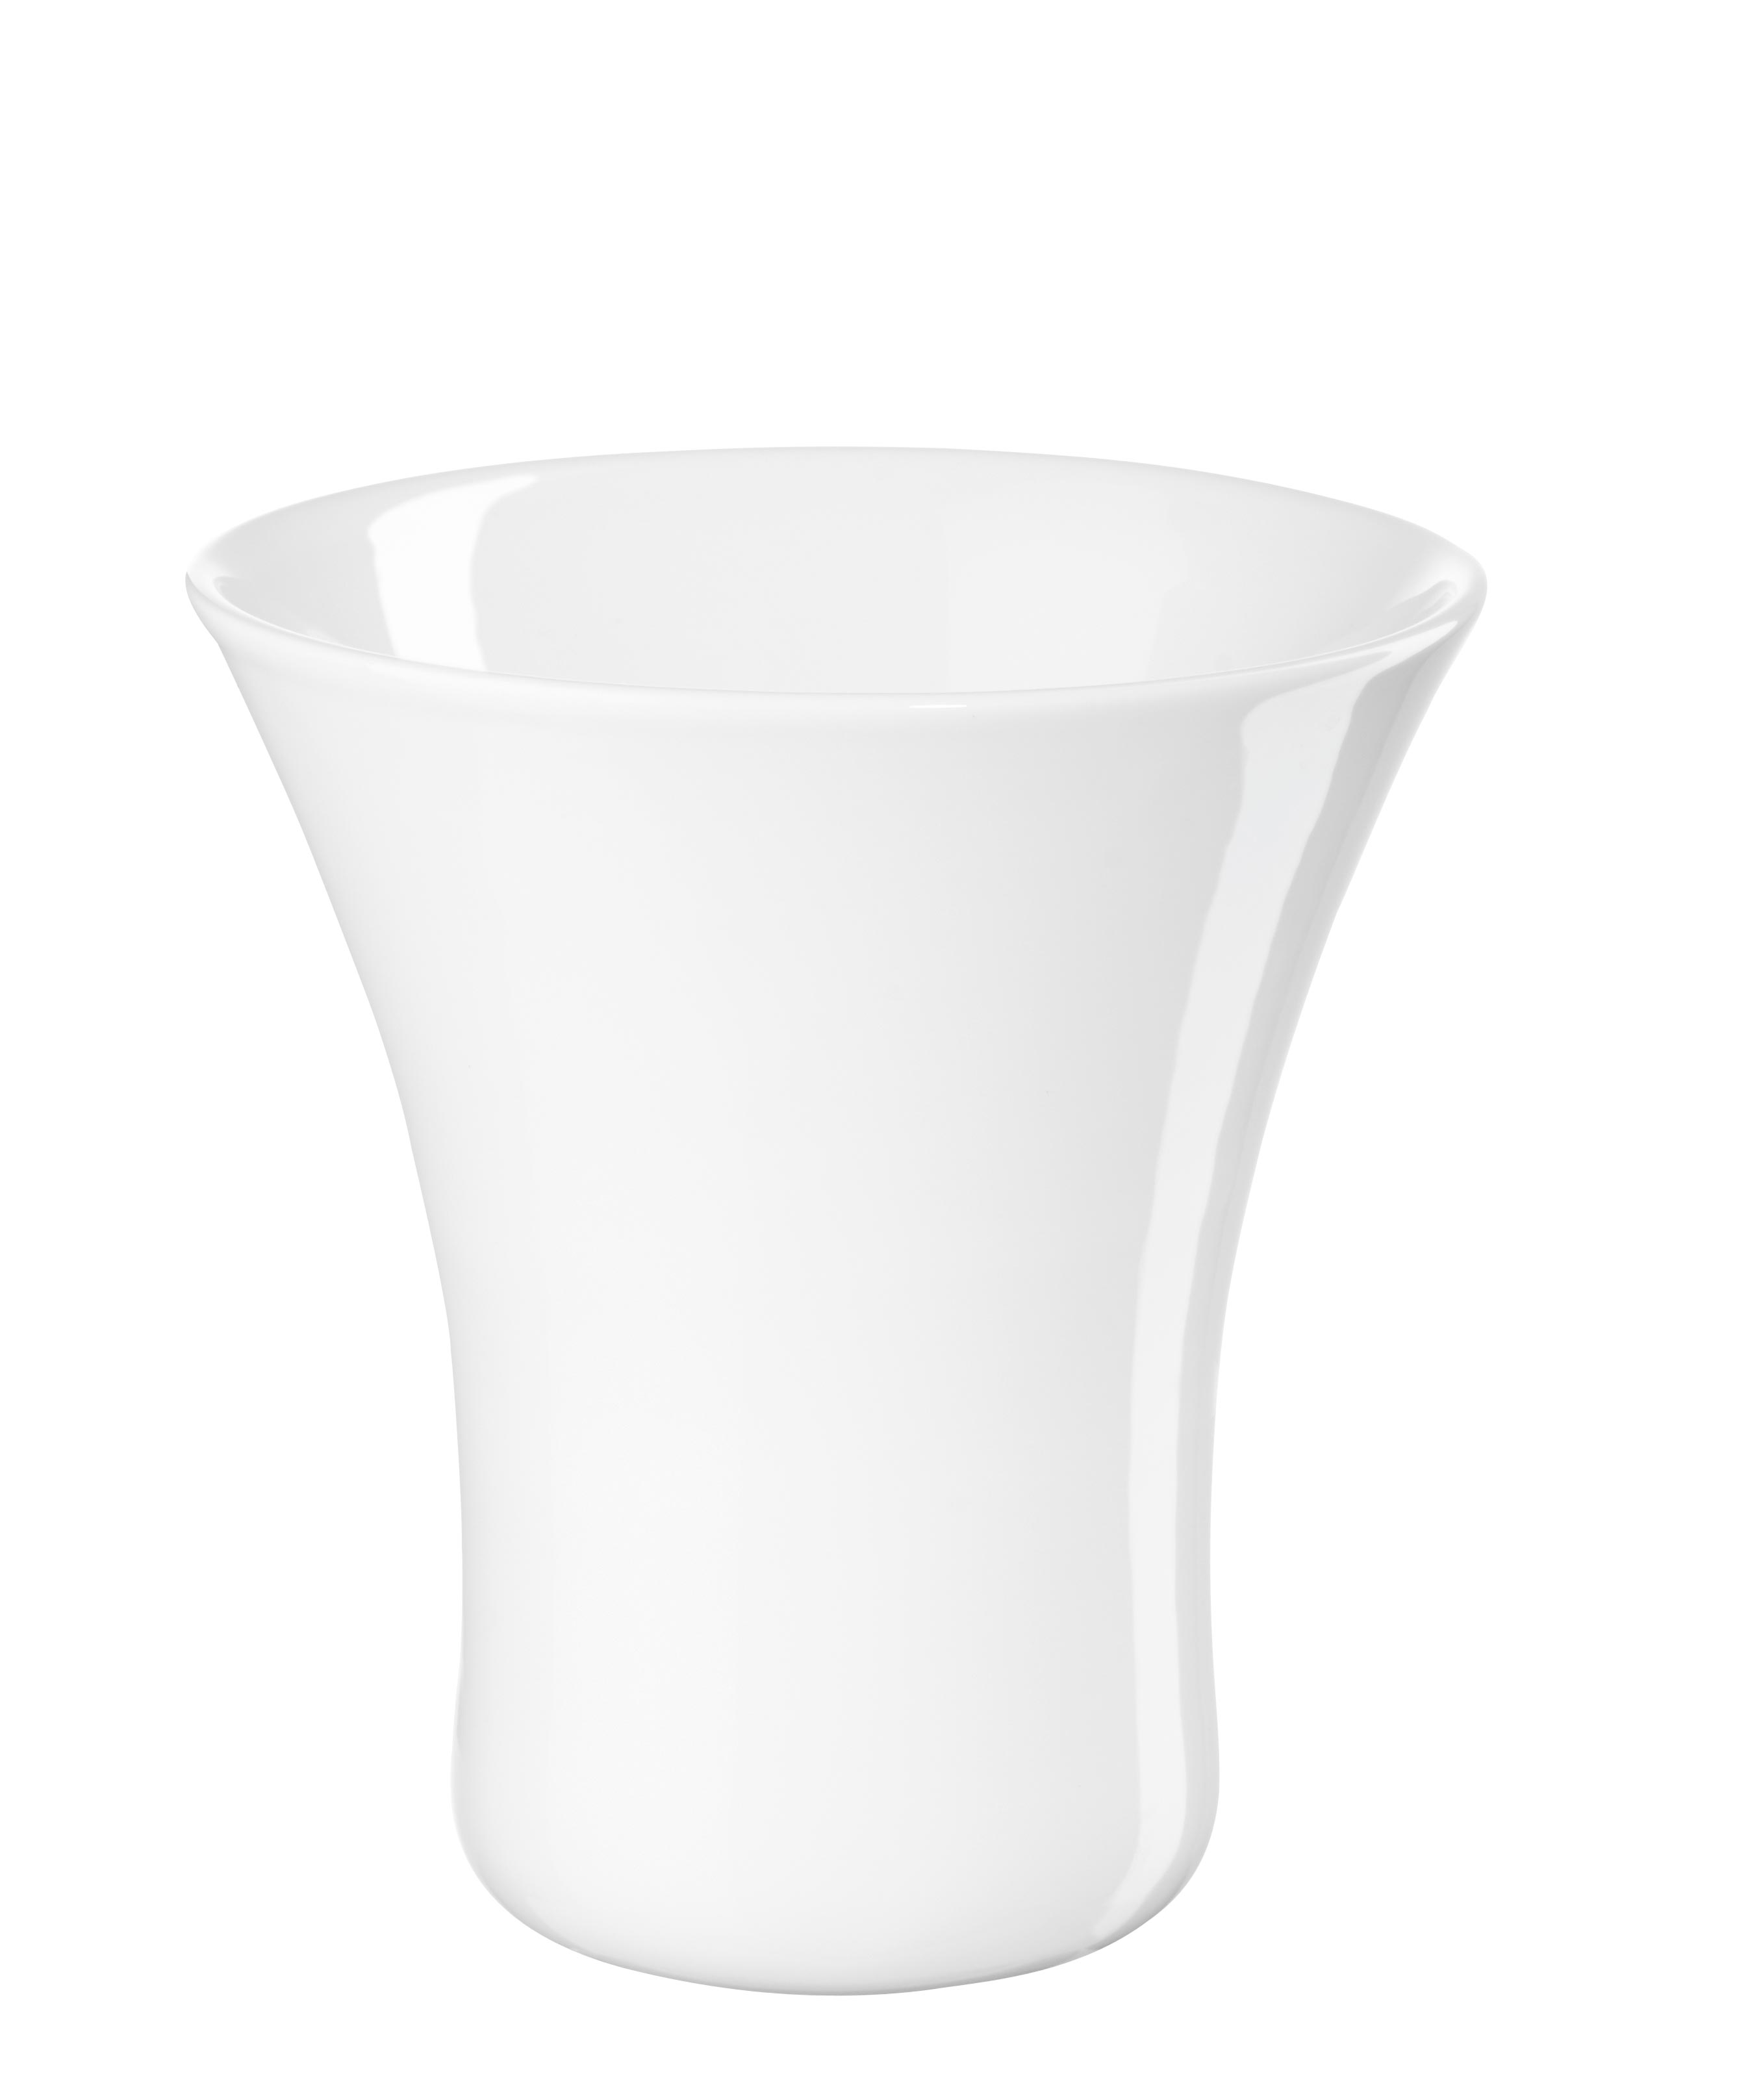 vase wei blumenvasen vasen bert pfe produkte. Black Bedroom Furniture Sets. Home Design Ideas